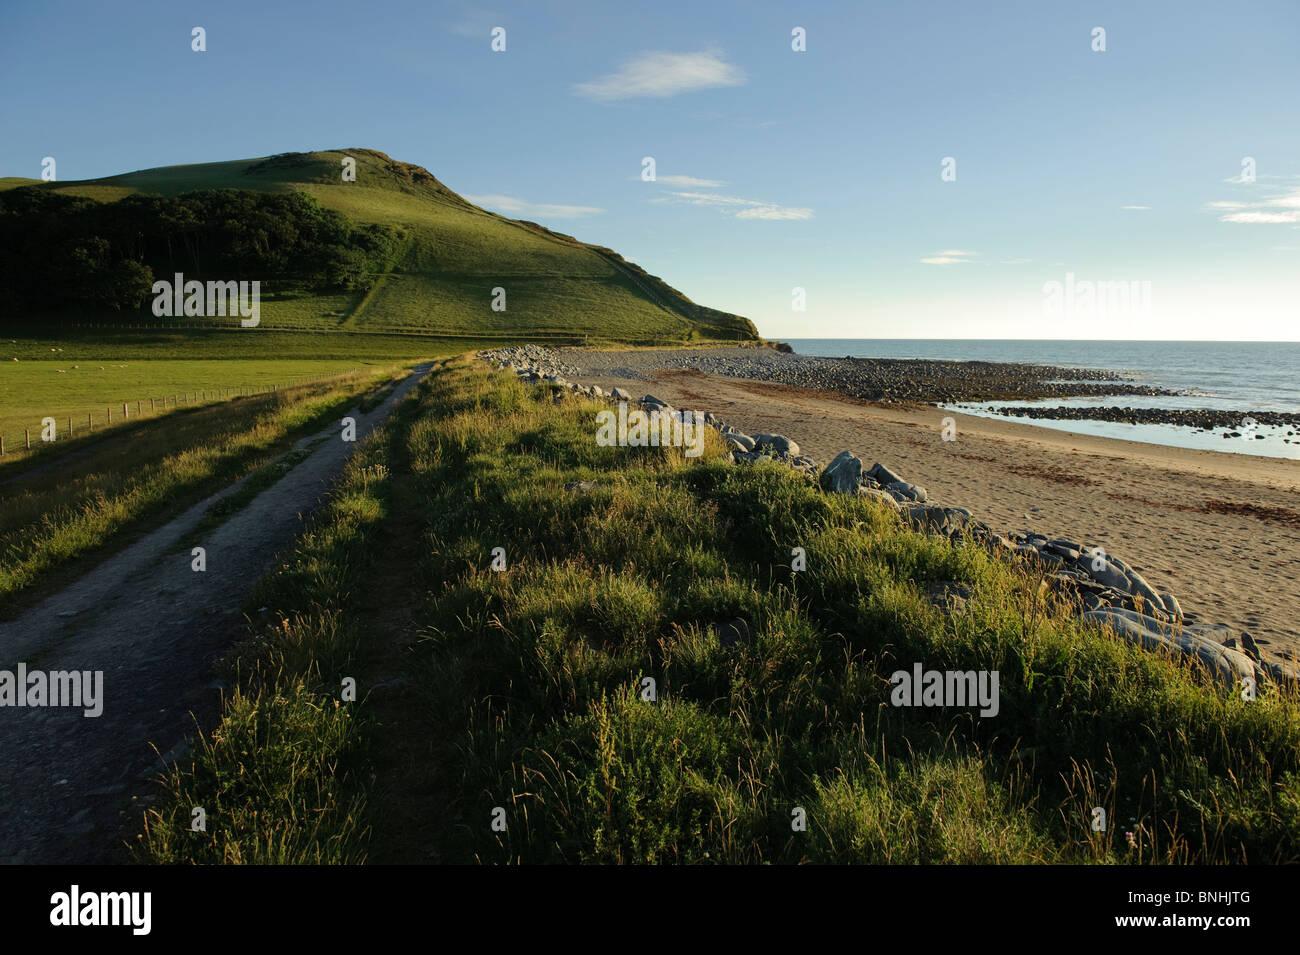 summer evening, Tanyblwch beach, Aberystwyth Wales UK - Stock Image